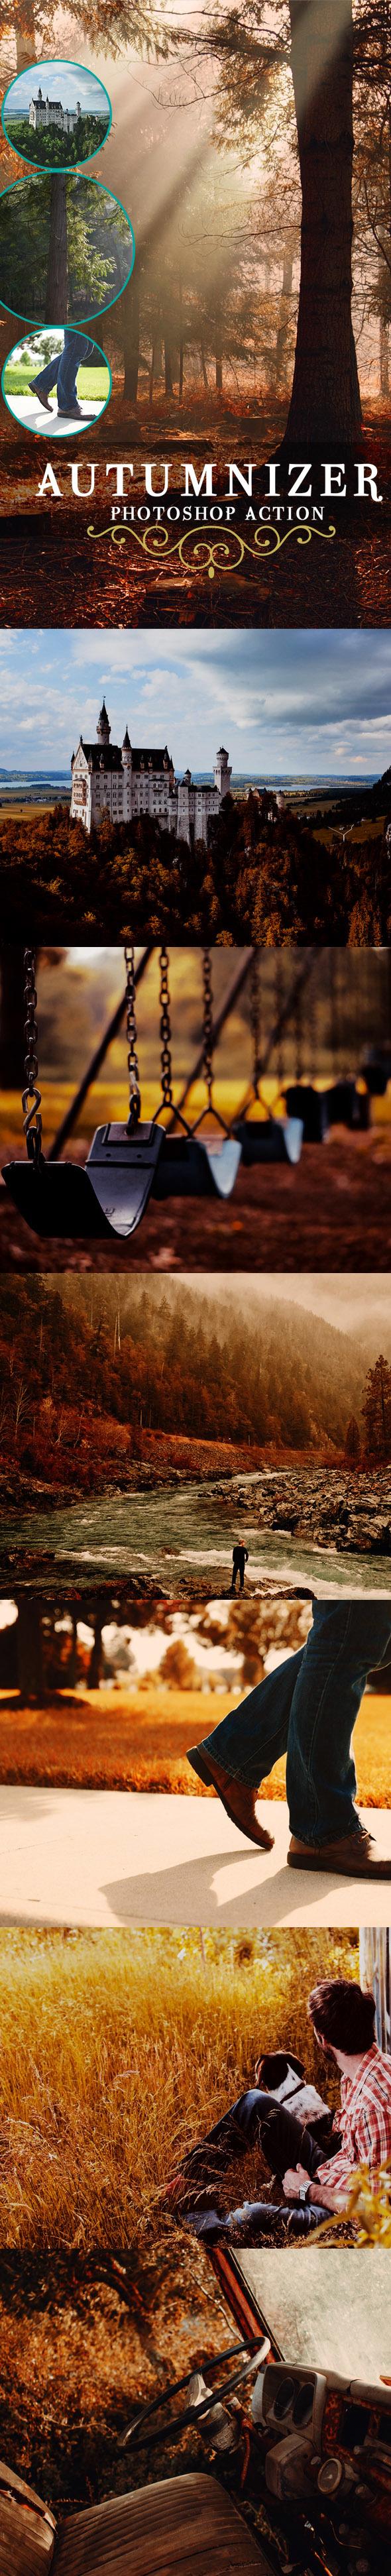 Autumnizer Photoshop Actions - Photo Effects Actions